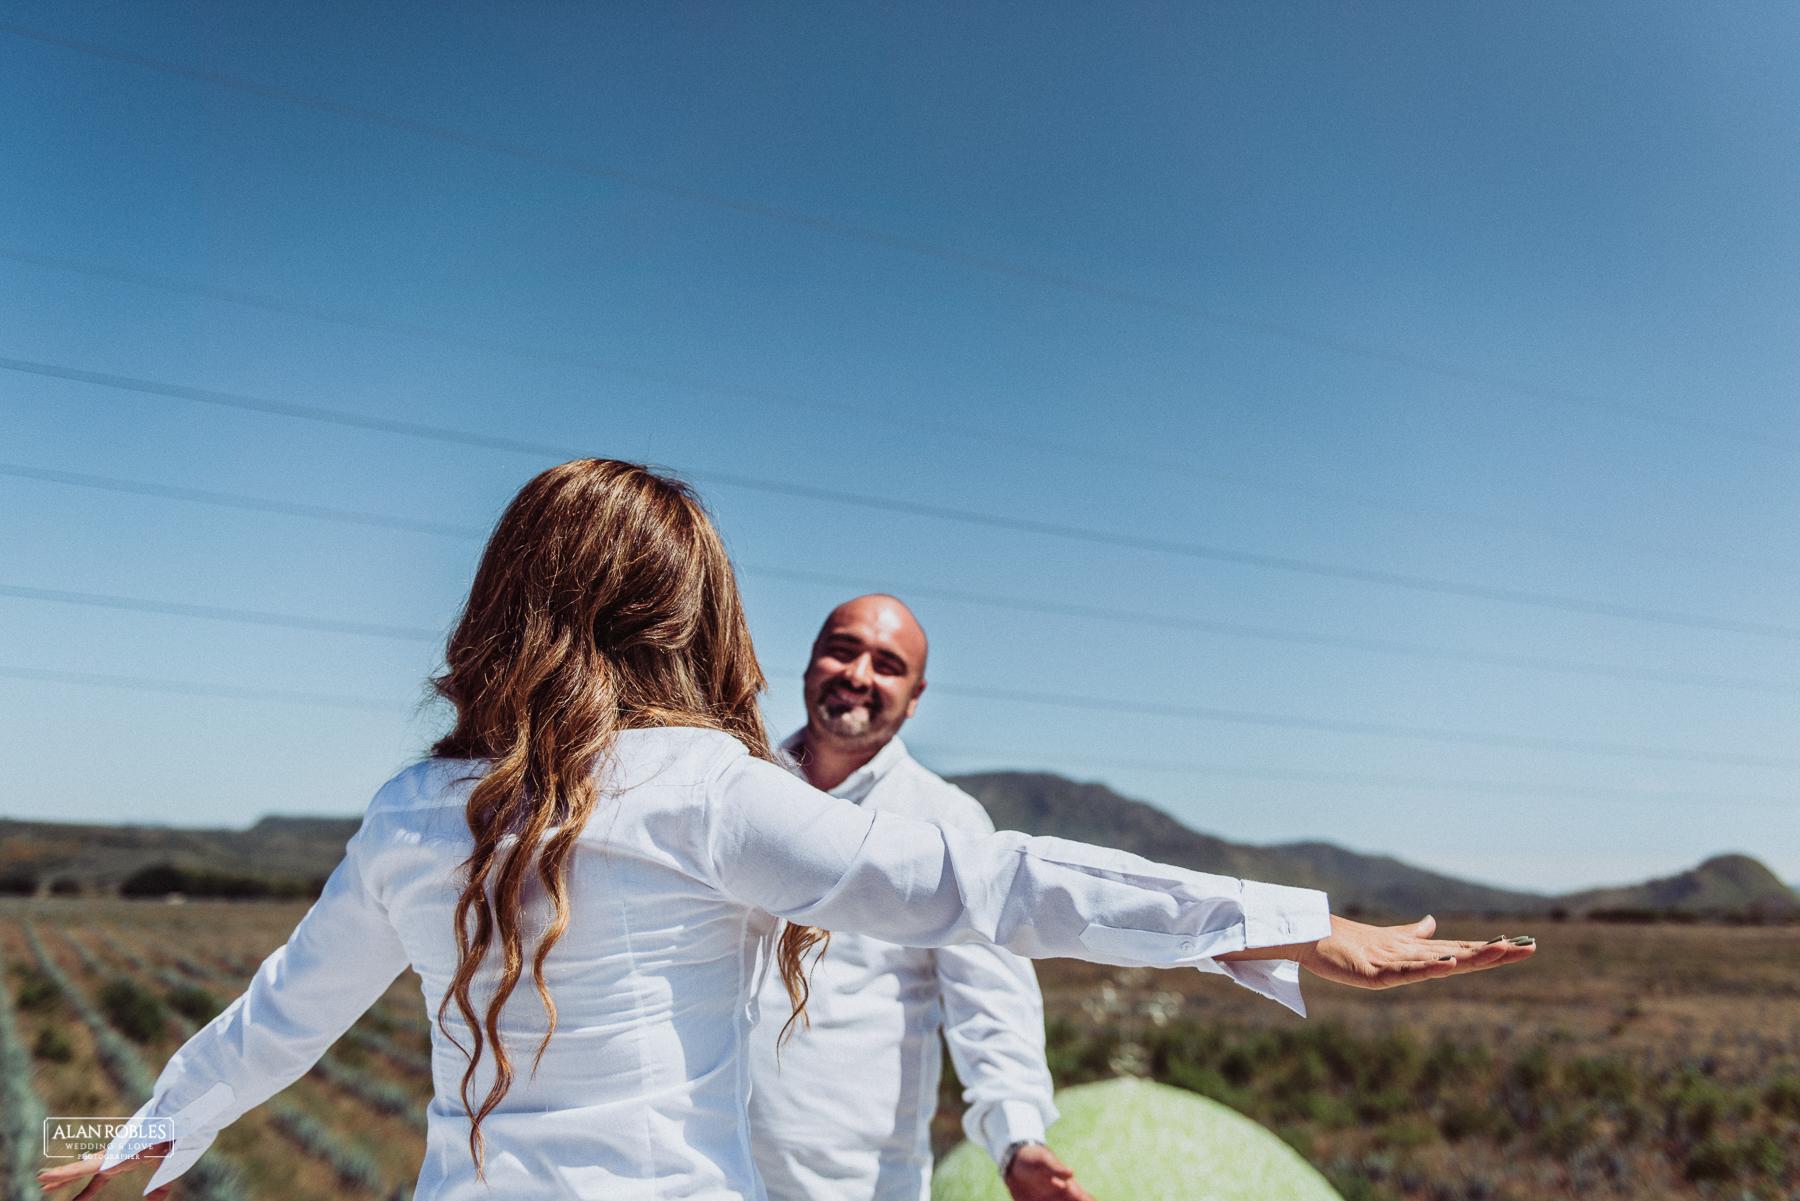 PreBoda KyA Guadalajara-Fotografo de bodas Alan Robles-19